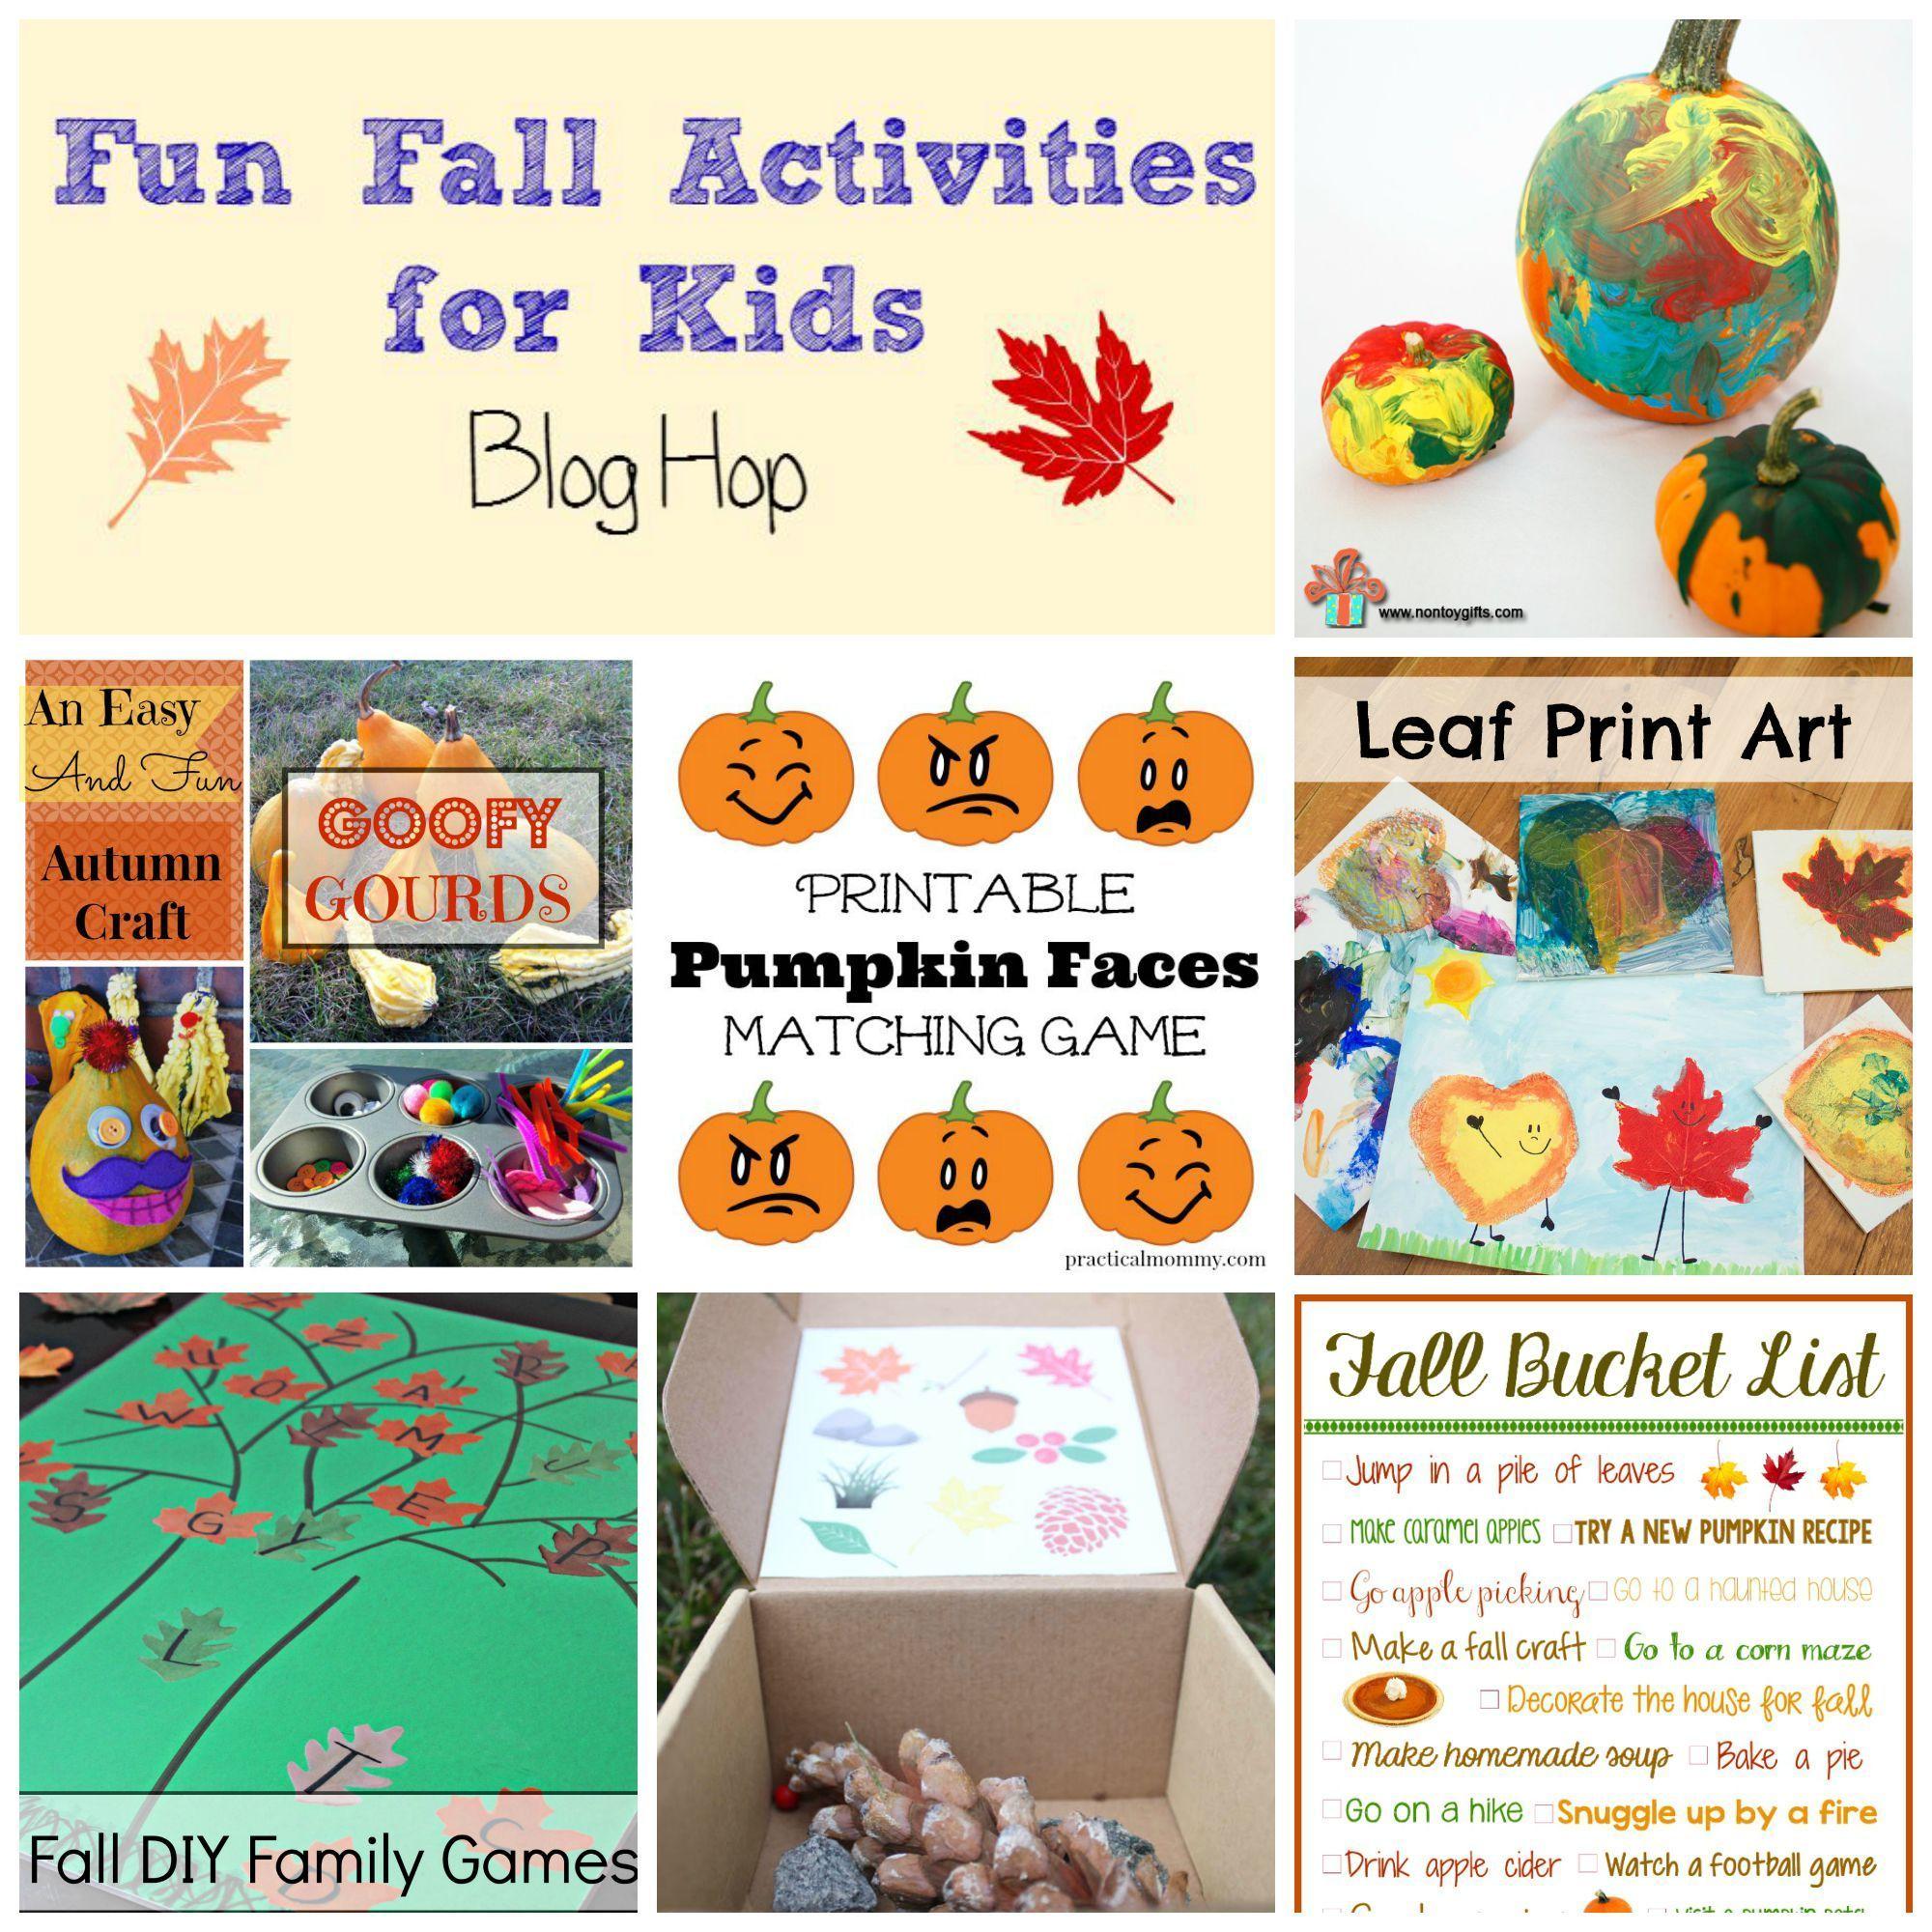 Printable Pumpkin Faces Matching Game Amp Other Fun Fall